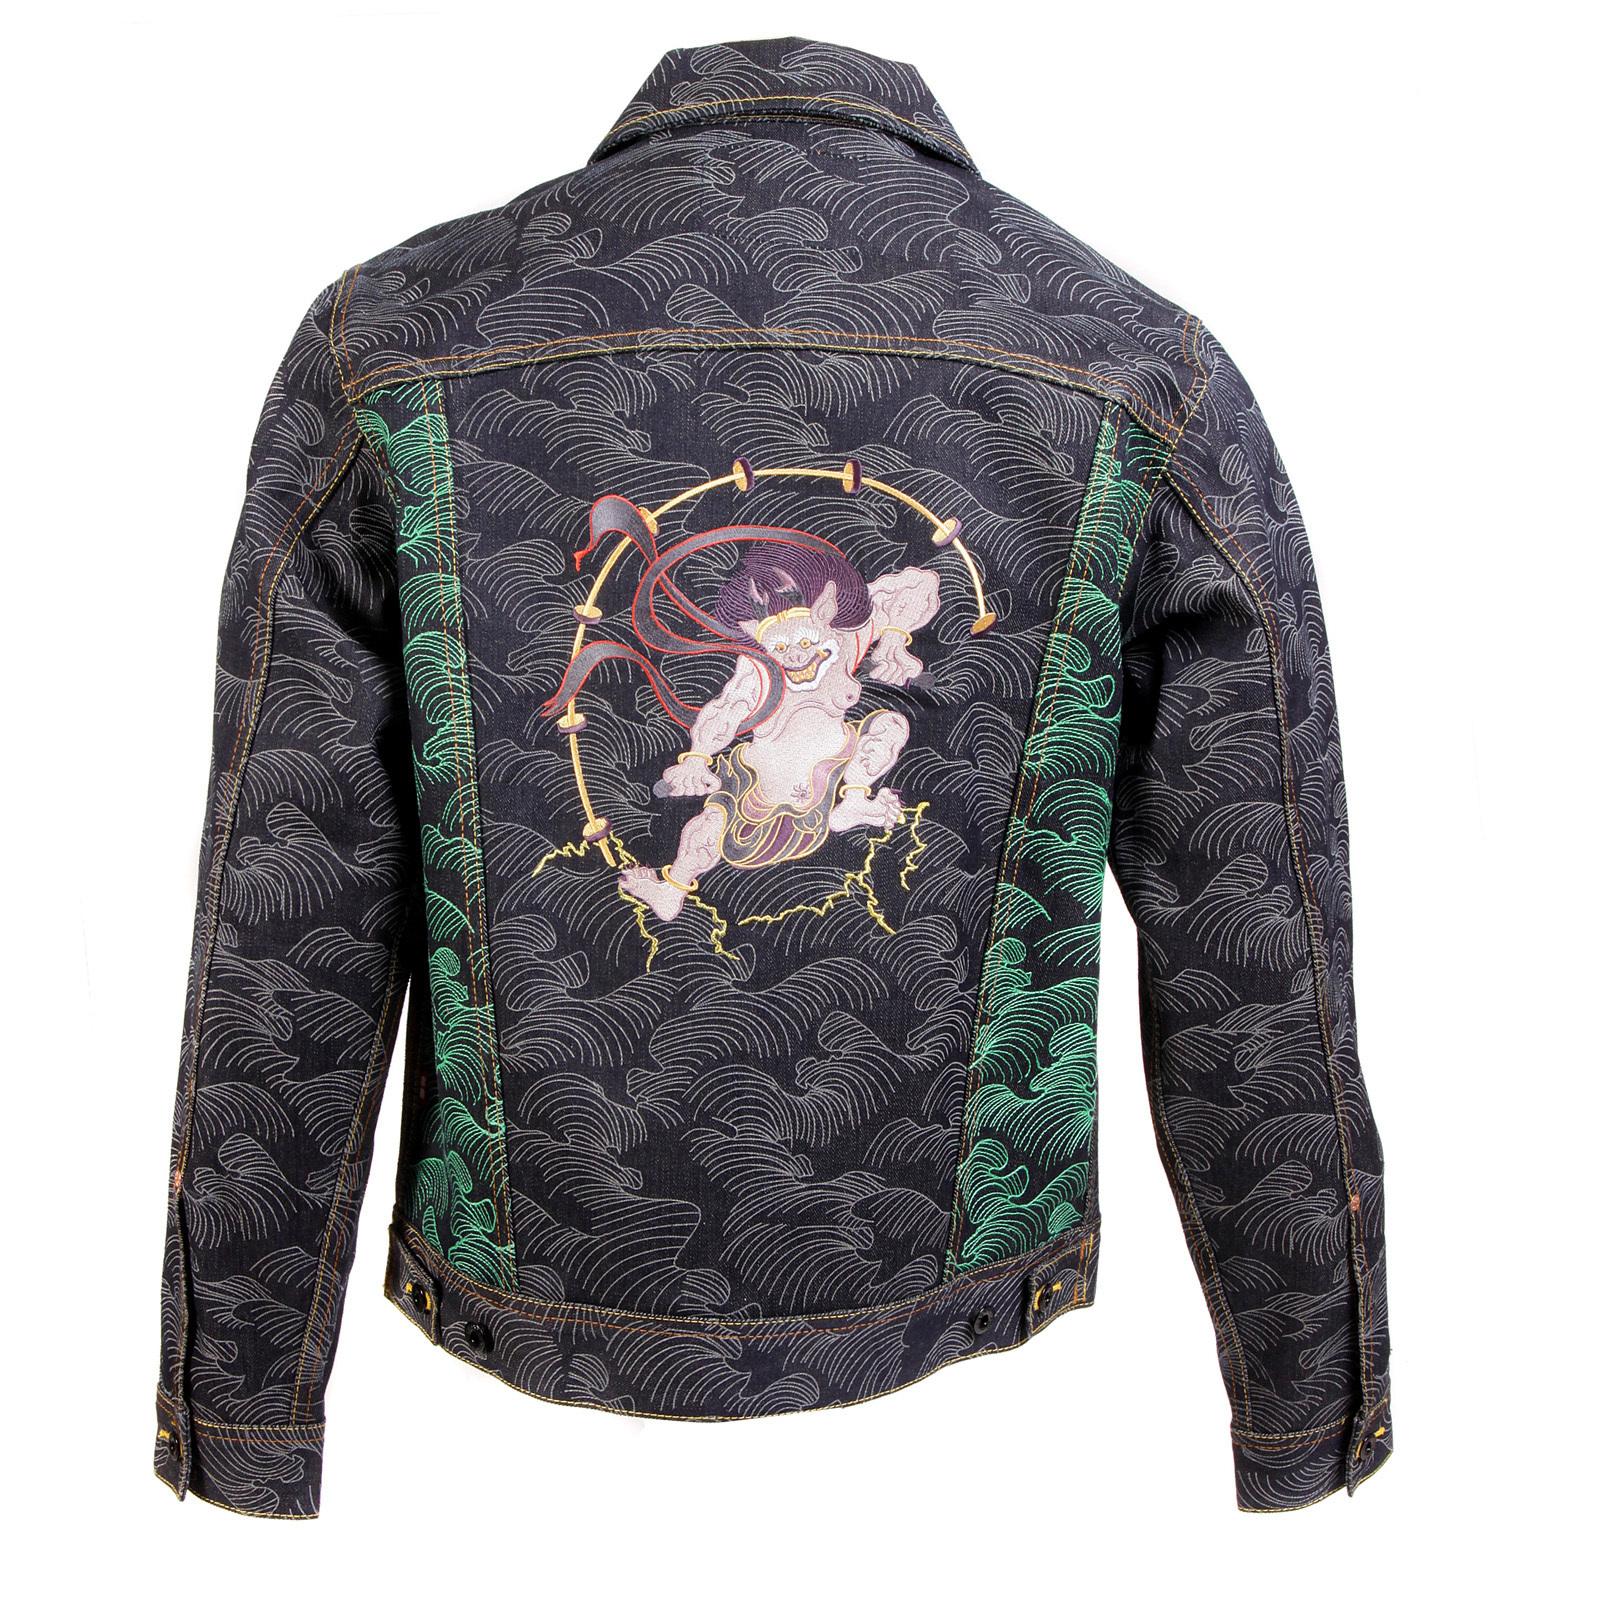 New Design Head Embroidery Denim Jacket Men 2015 Single Breasted Blue Jean  Jacket Coat Turn-